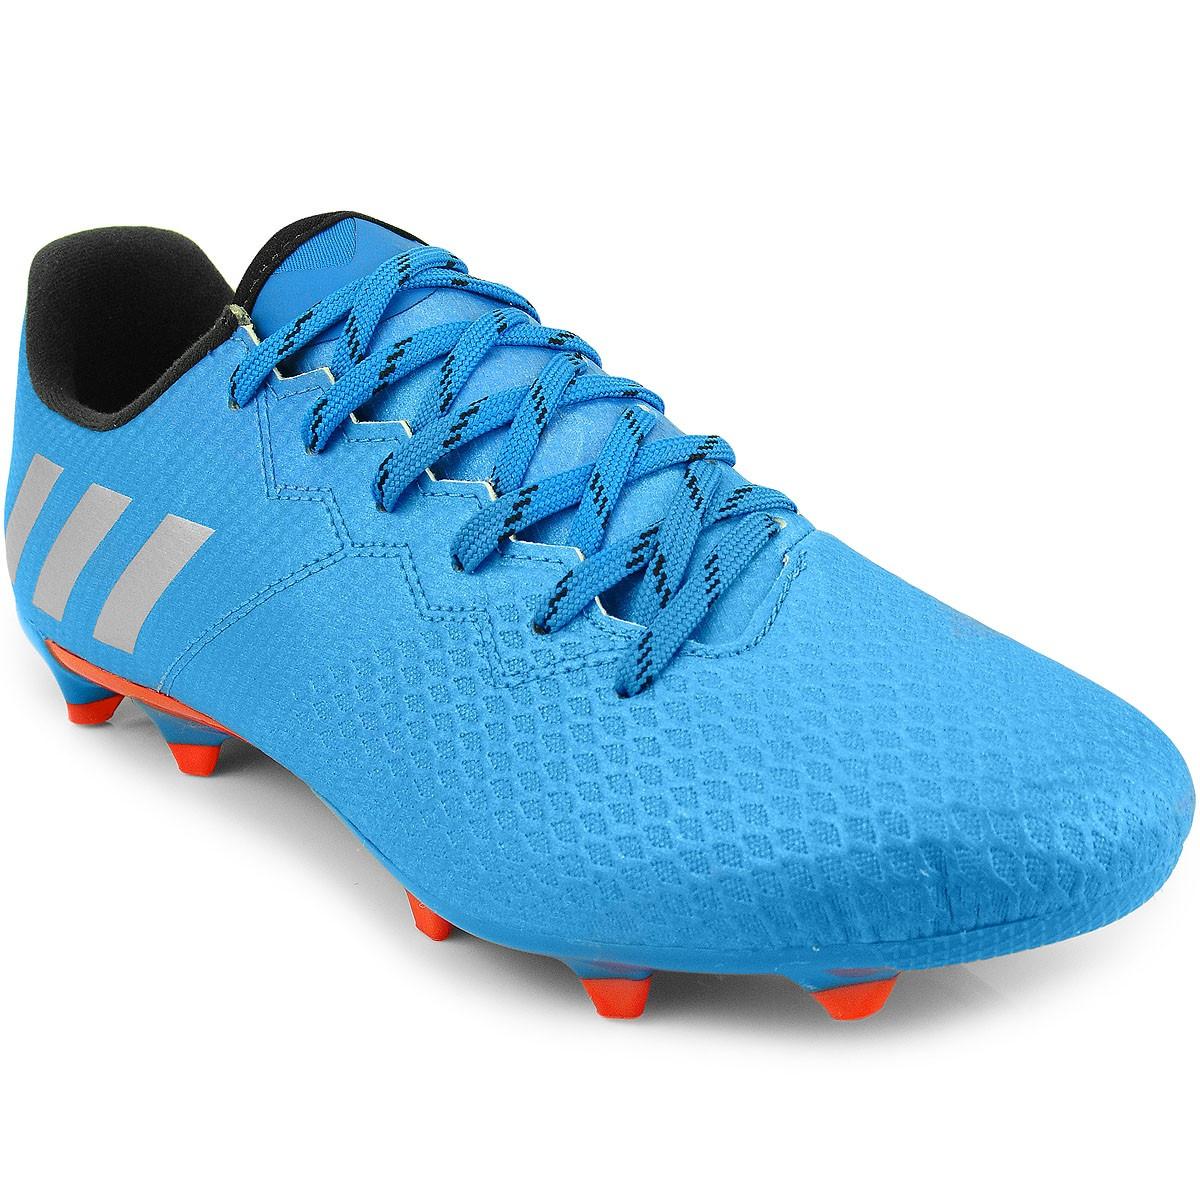 Chuteira Adidas Messi 16.3 FG  c95b516077128